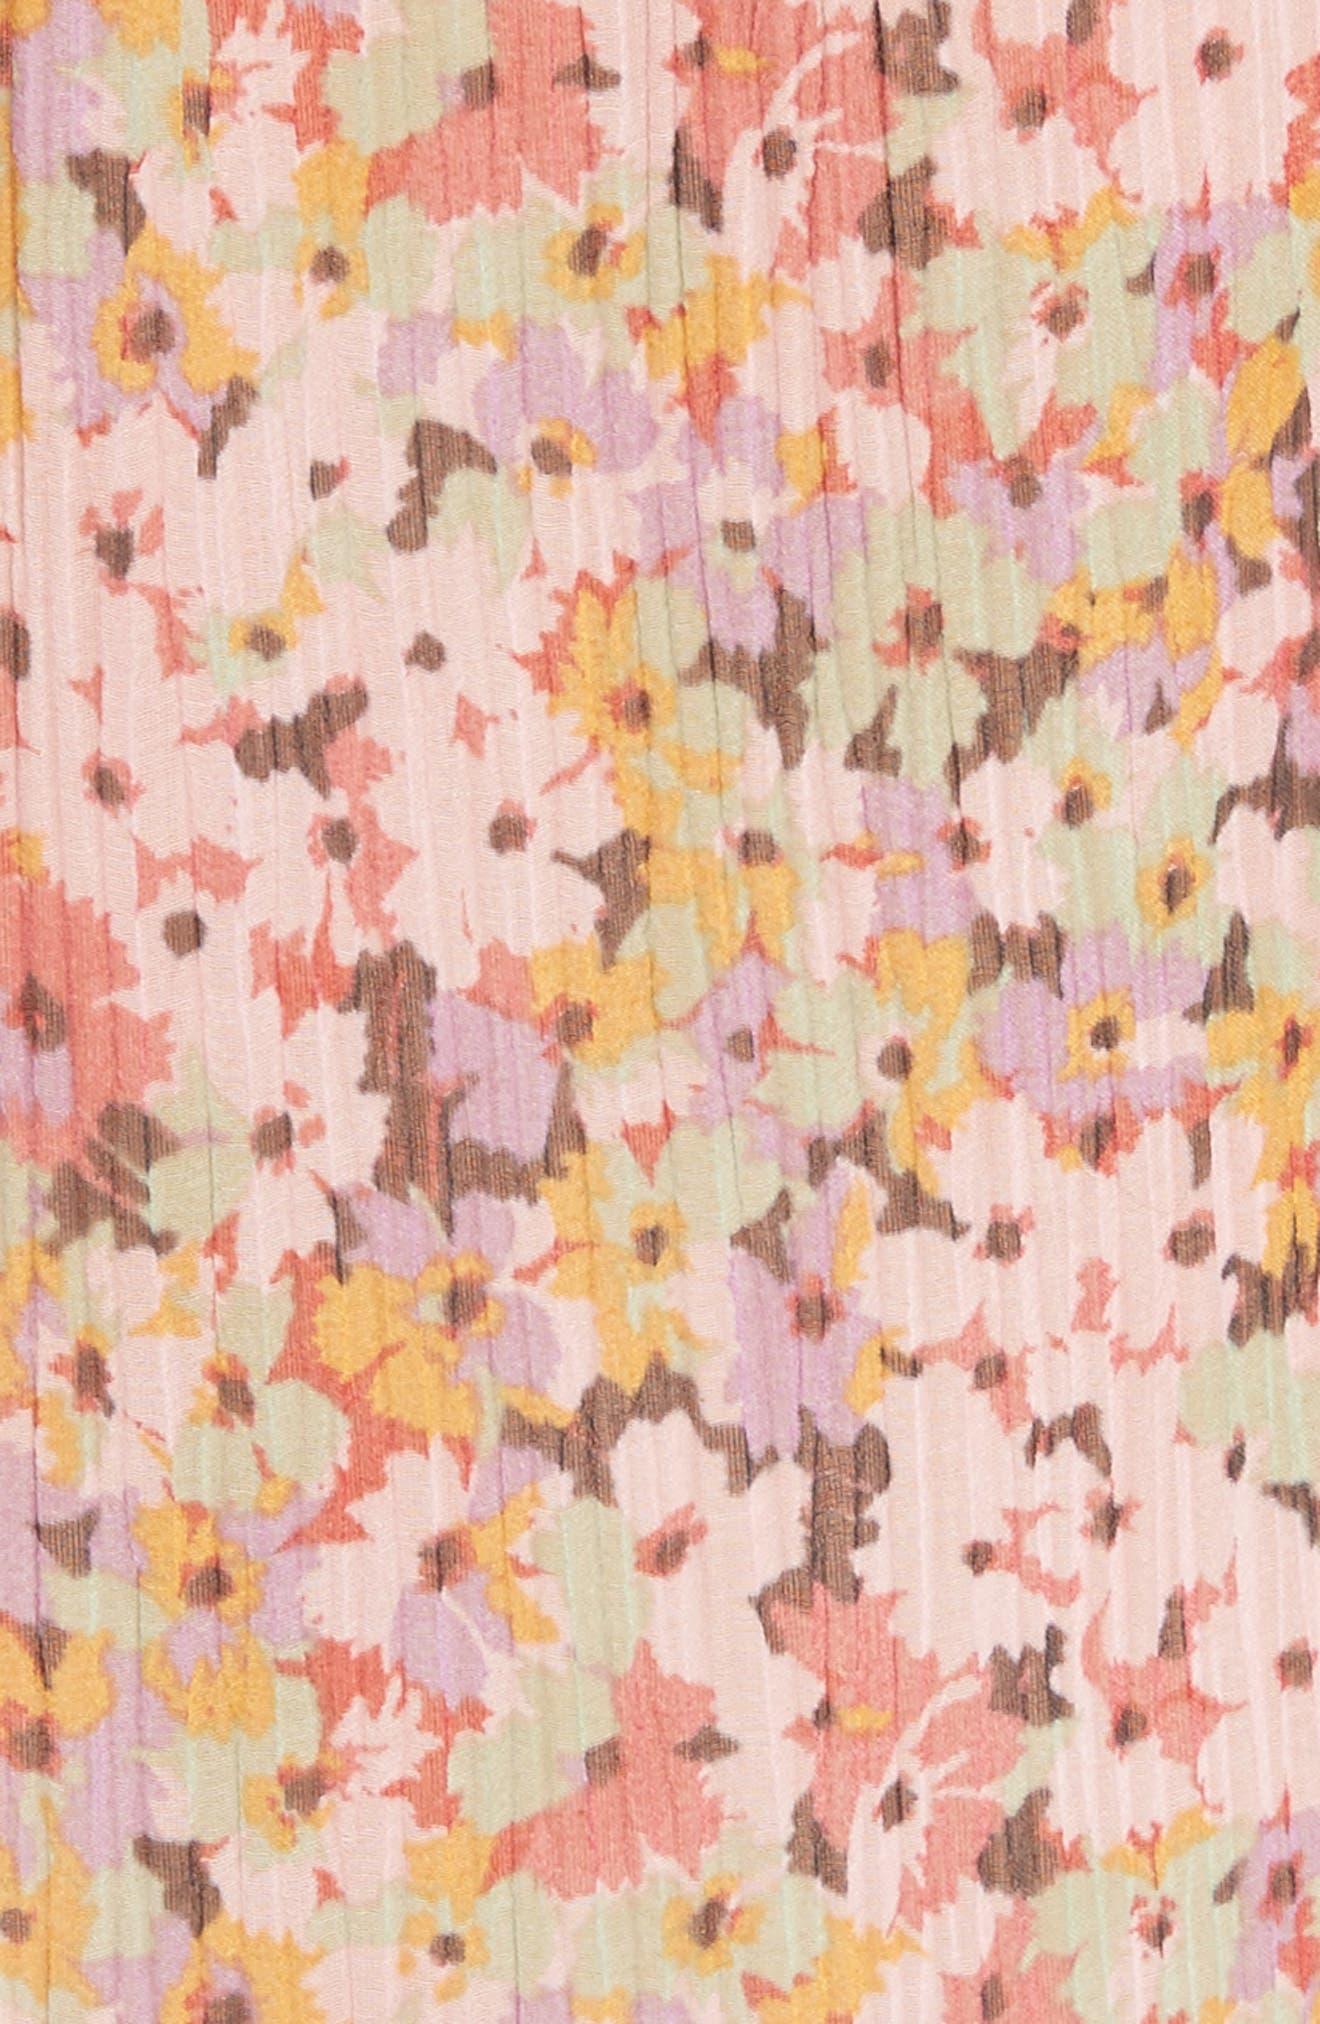 Margo Ruffled Floral Drop Waist Dress,                             Alternate thumbnail 5, color,                             686